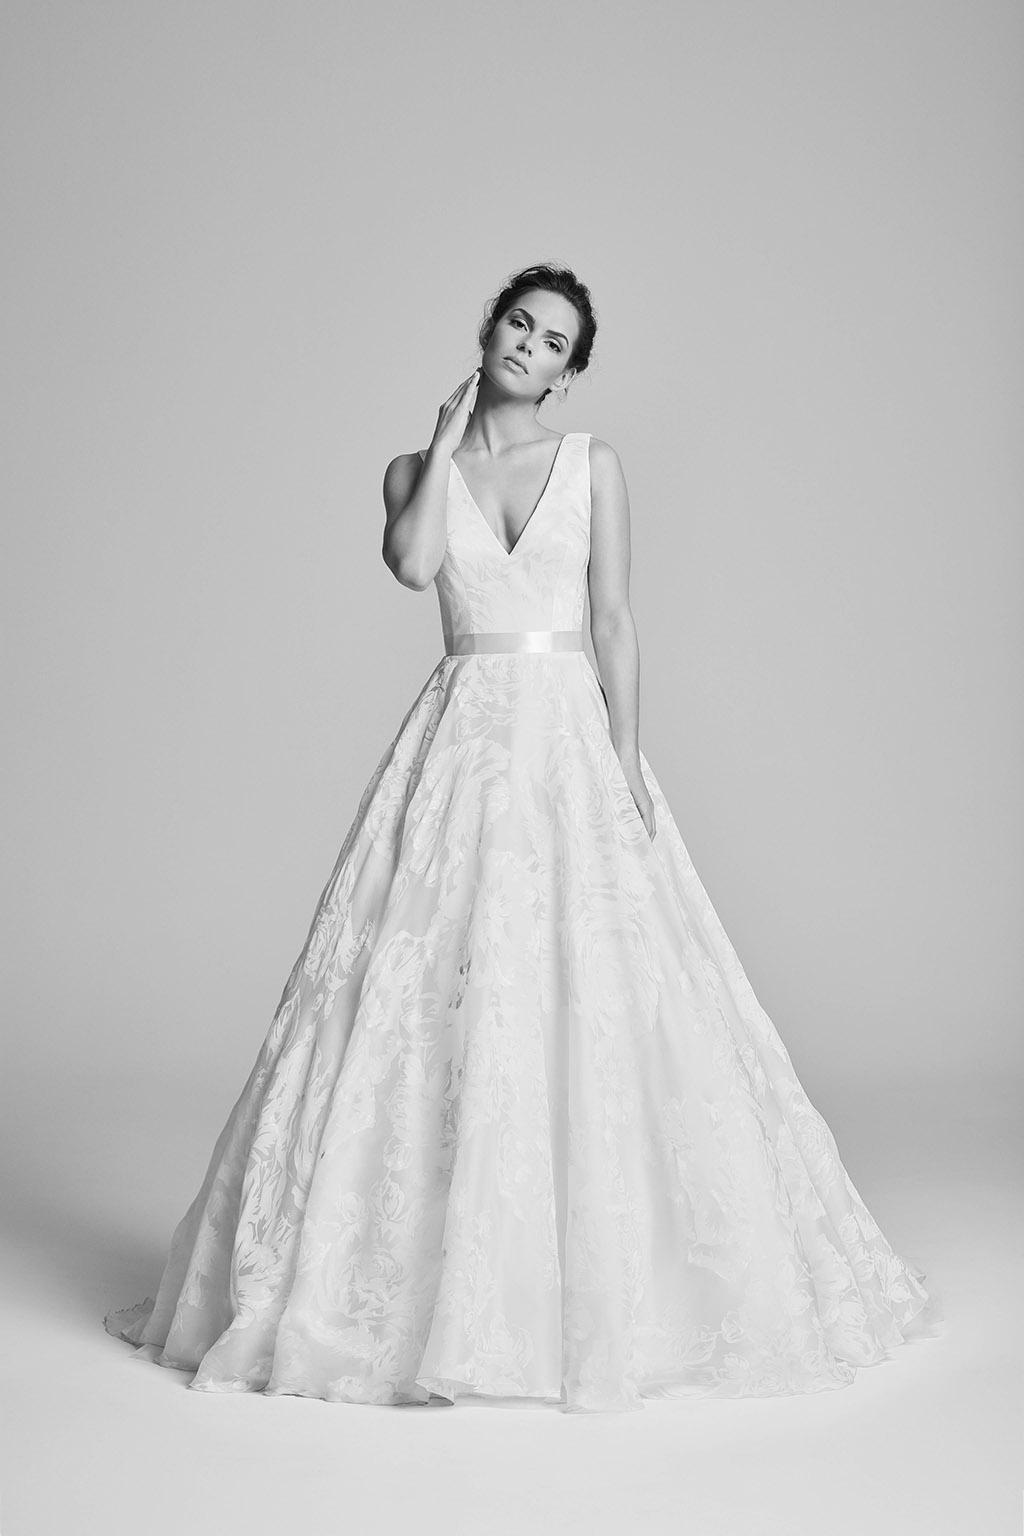 rosa-wedding-dresses-uk-belle-epoque-collection-2018.jpg